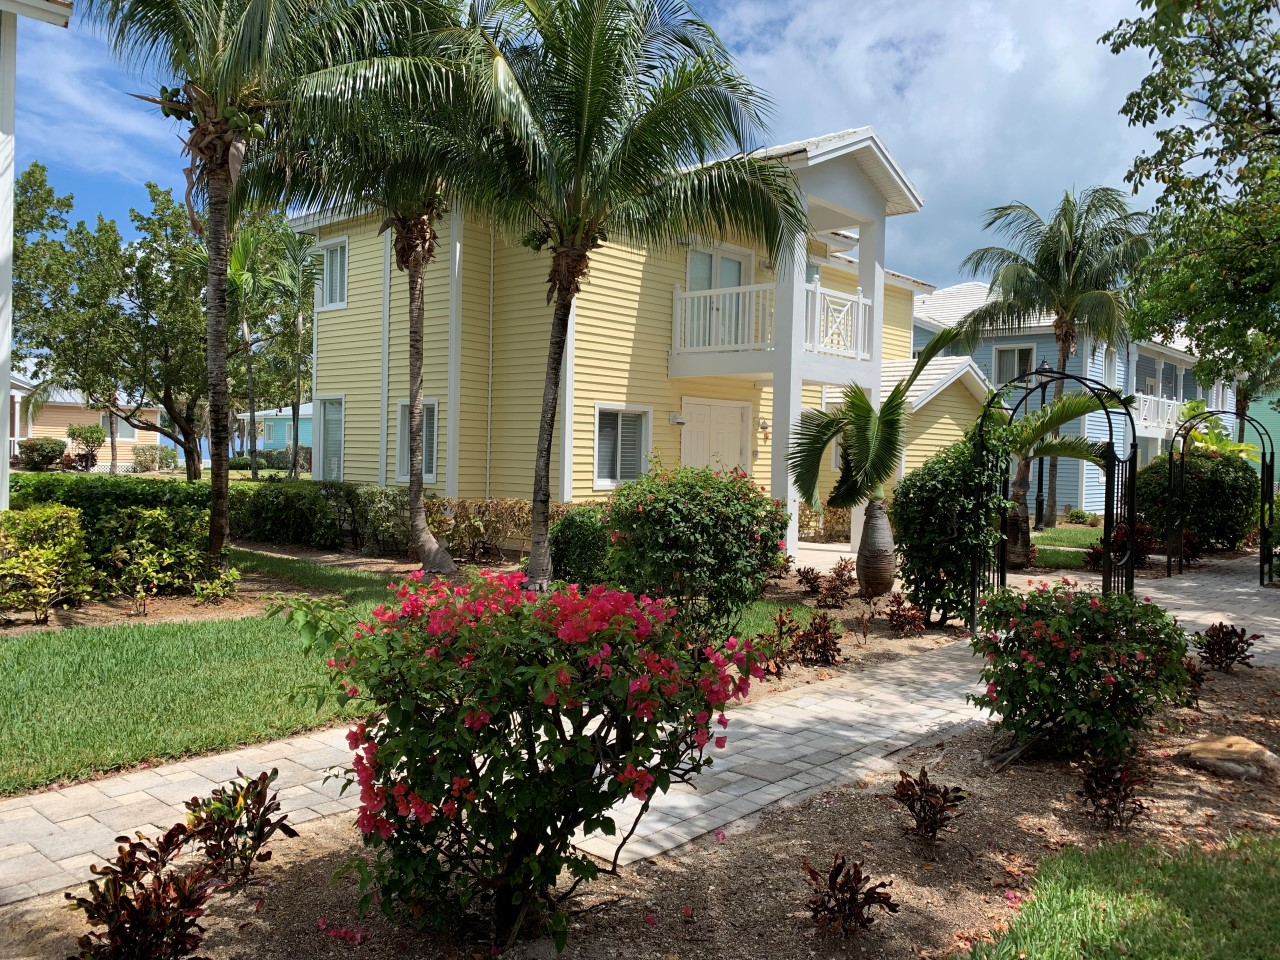 Bimini Bay Home